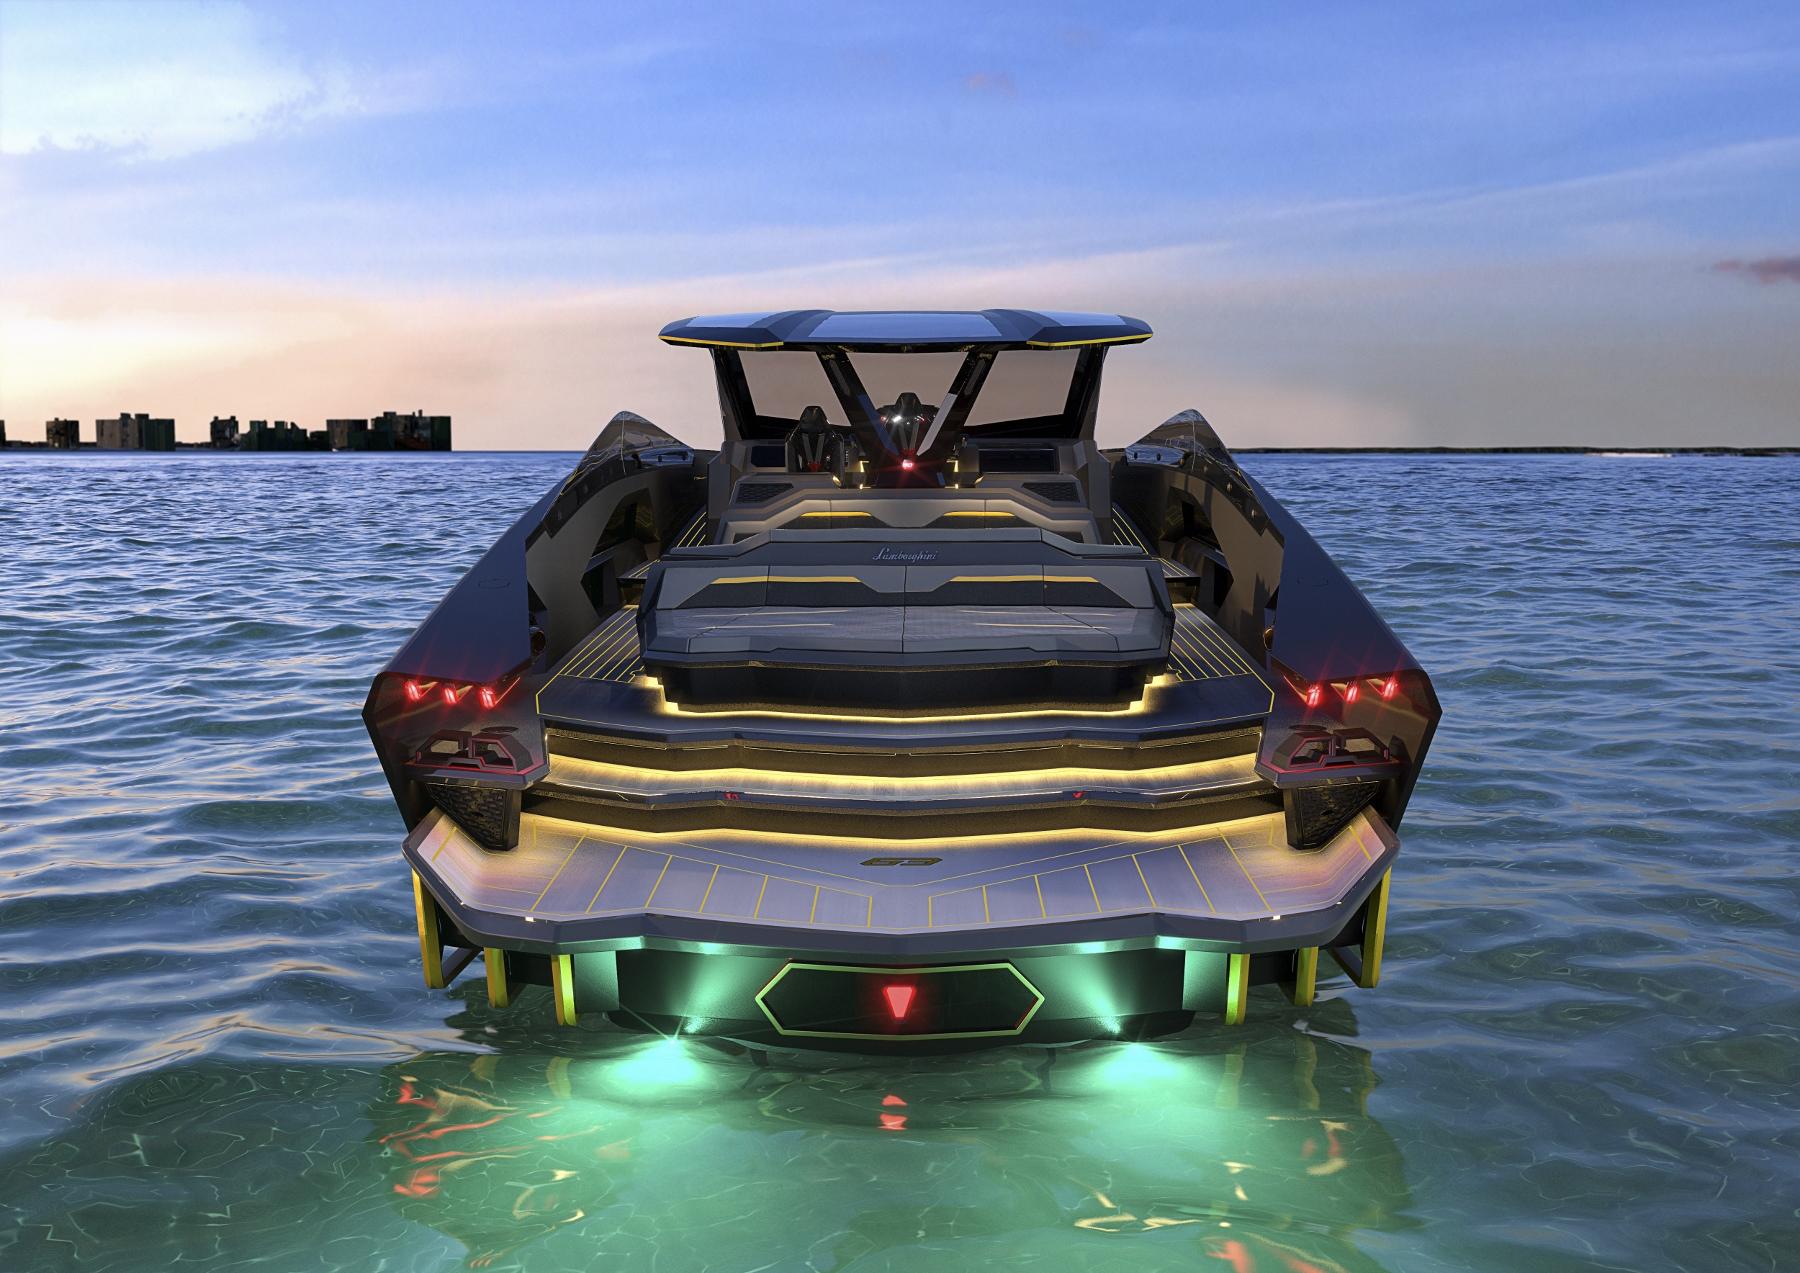 Tecnomar for Lamborghini 63 (18)